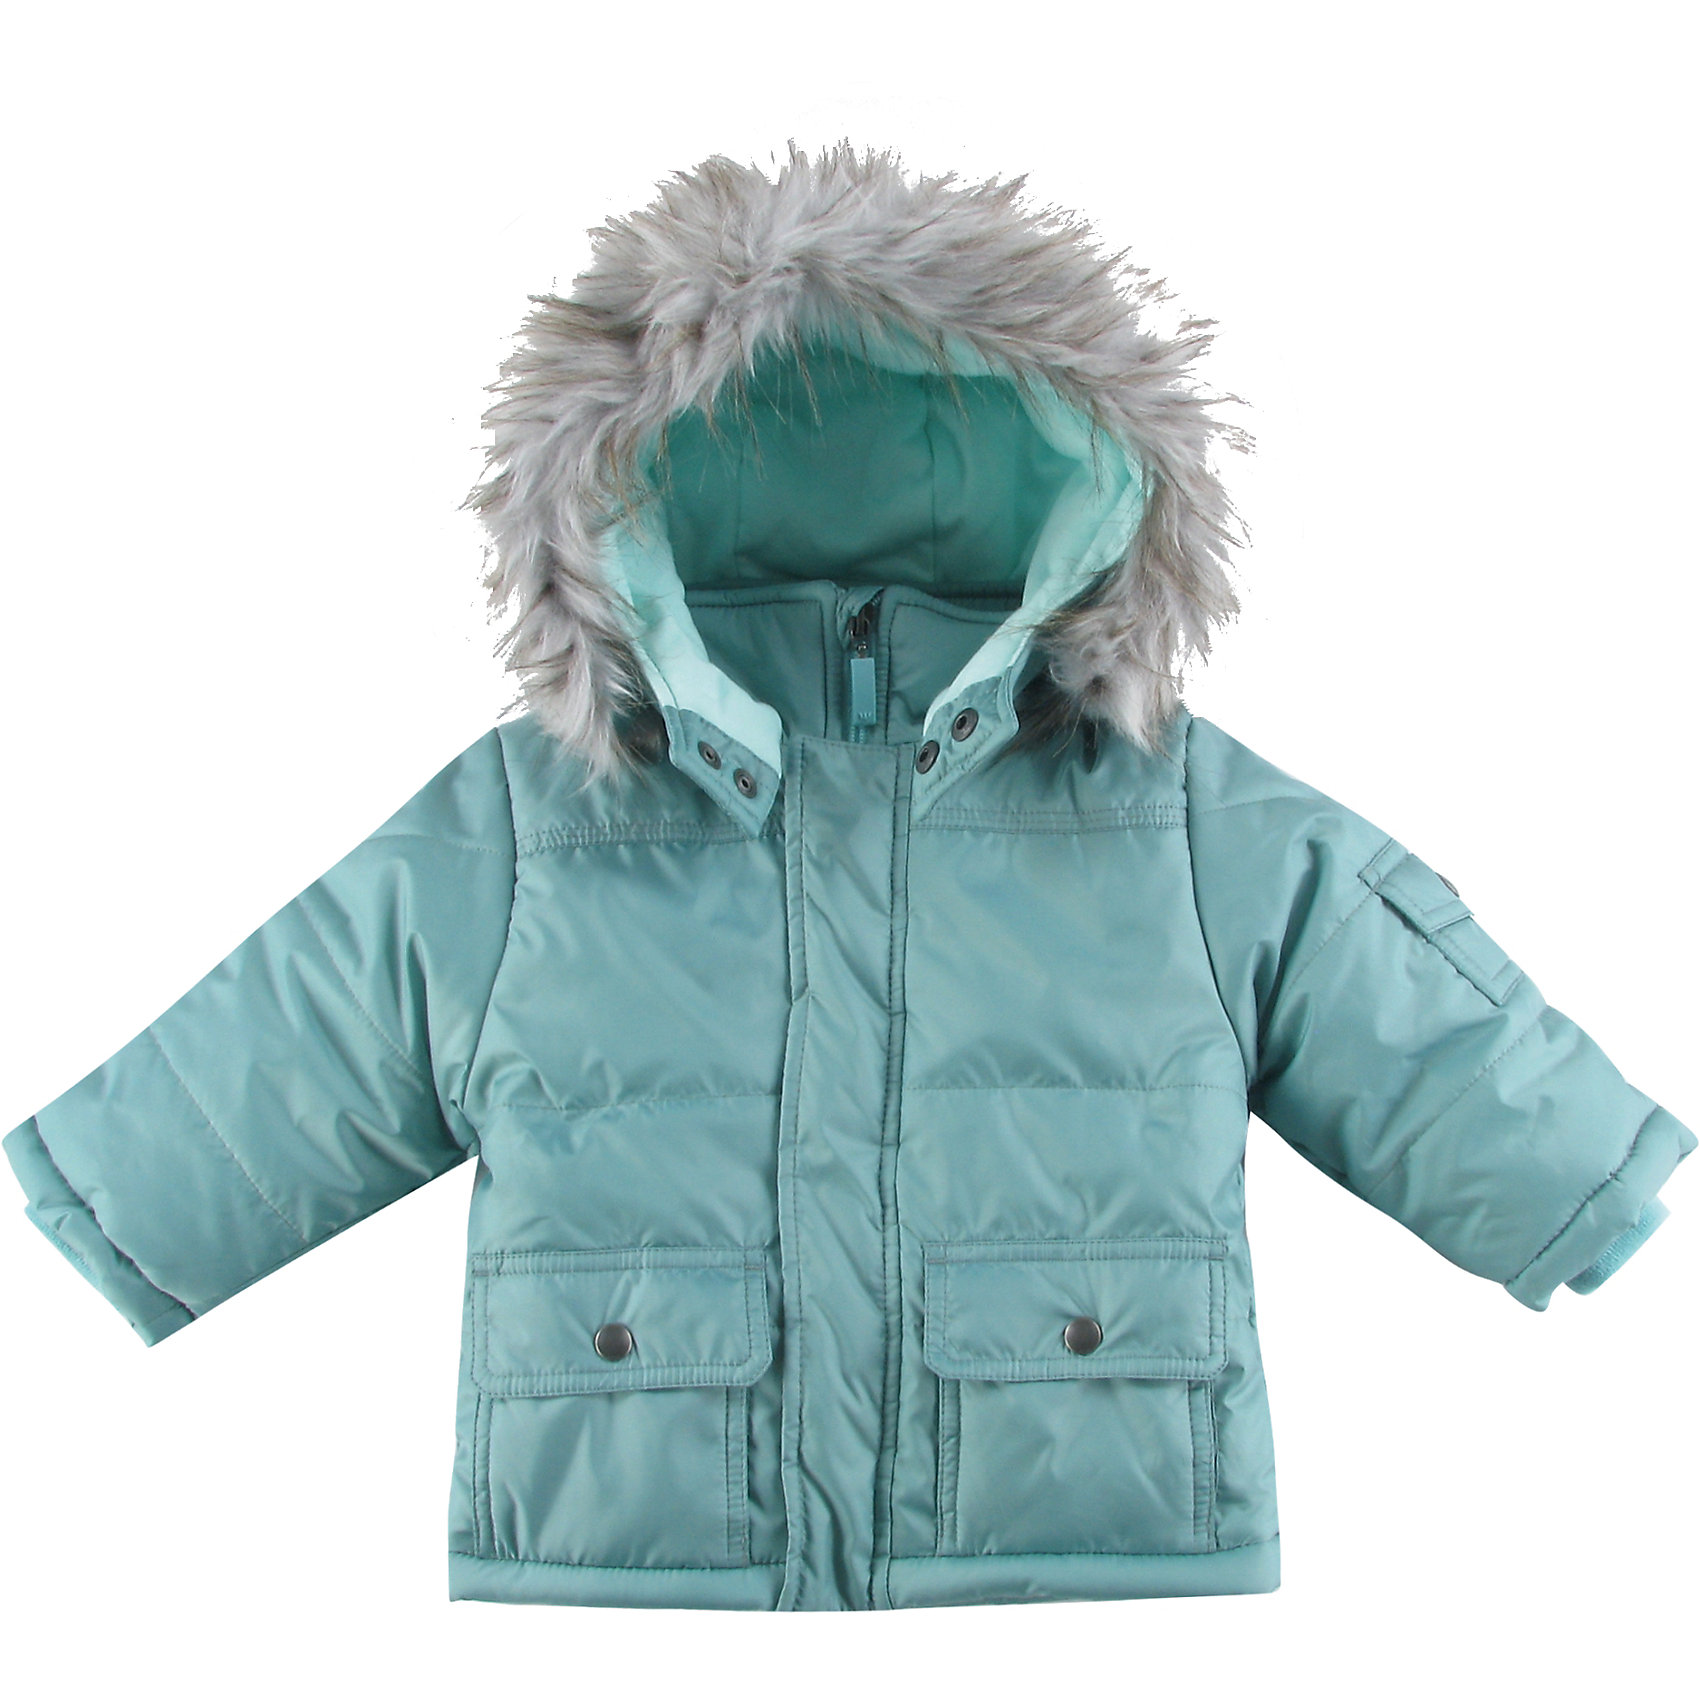 Куртка утепленная для мальчика WojcikВерхняя одежда<br>Куртка утепленная для мальчика Wojcik<br>Состав:<br>Полиэстер 100%<br><br>Ширина мм: 356<br>Глубина мм: 10<br>Высота мм: 245<br>Вес г: 519<br>Цвет: зеленый<br>Возраст от месяцев: 6<br>Возраст до месяцев: 9<br>Пол: Мужской<br>Возраст: Детский<br>Размер: 74,98,80,86,92<br>SKU: 5591891